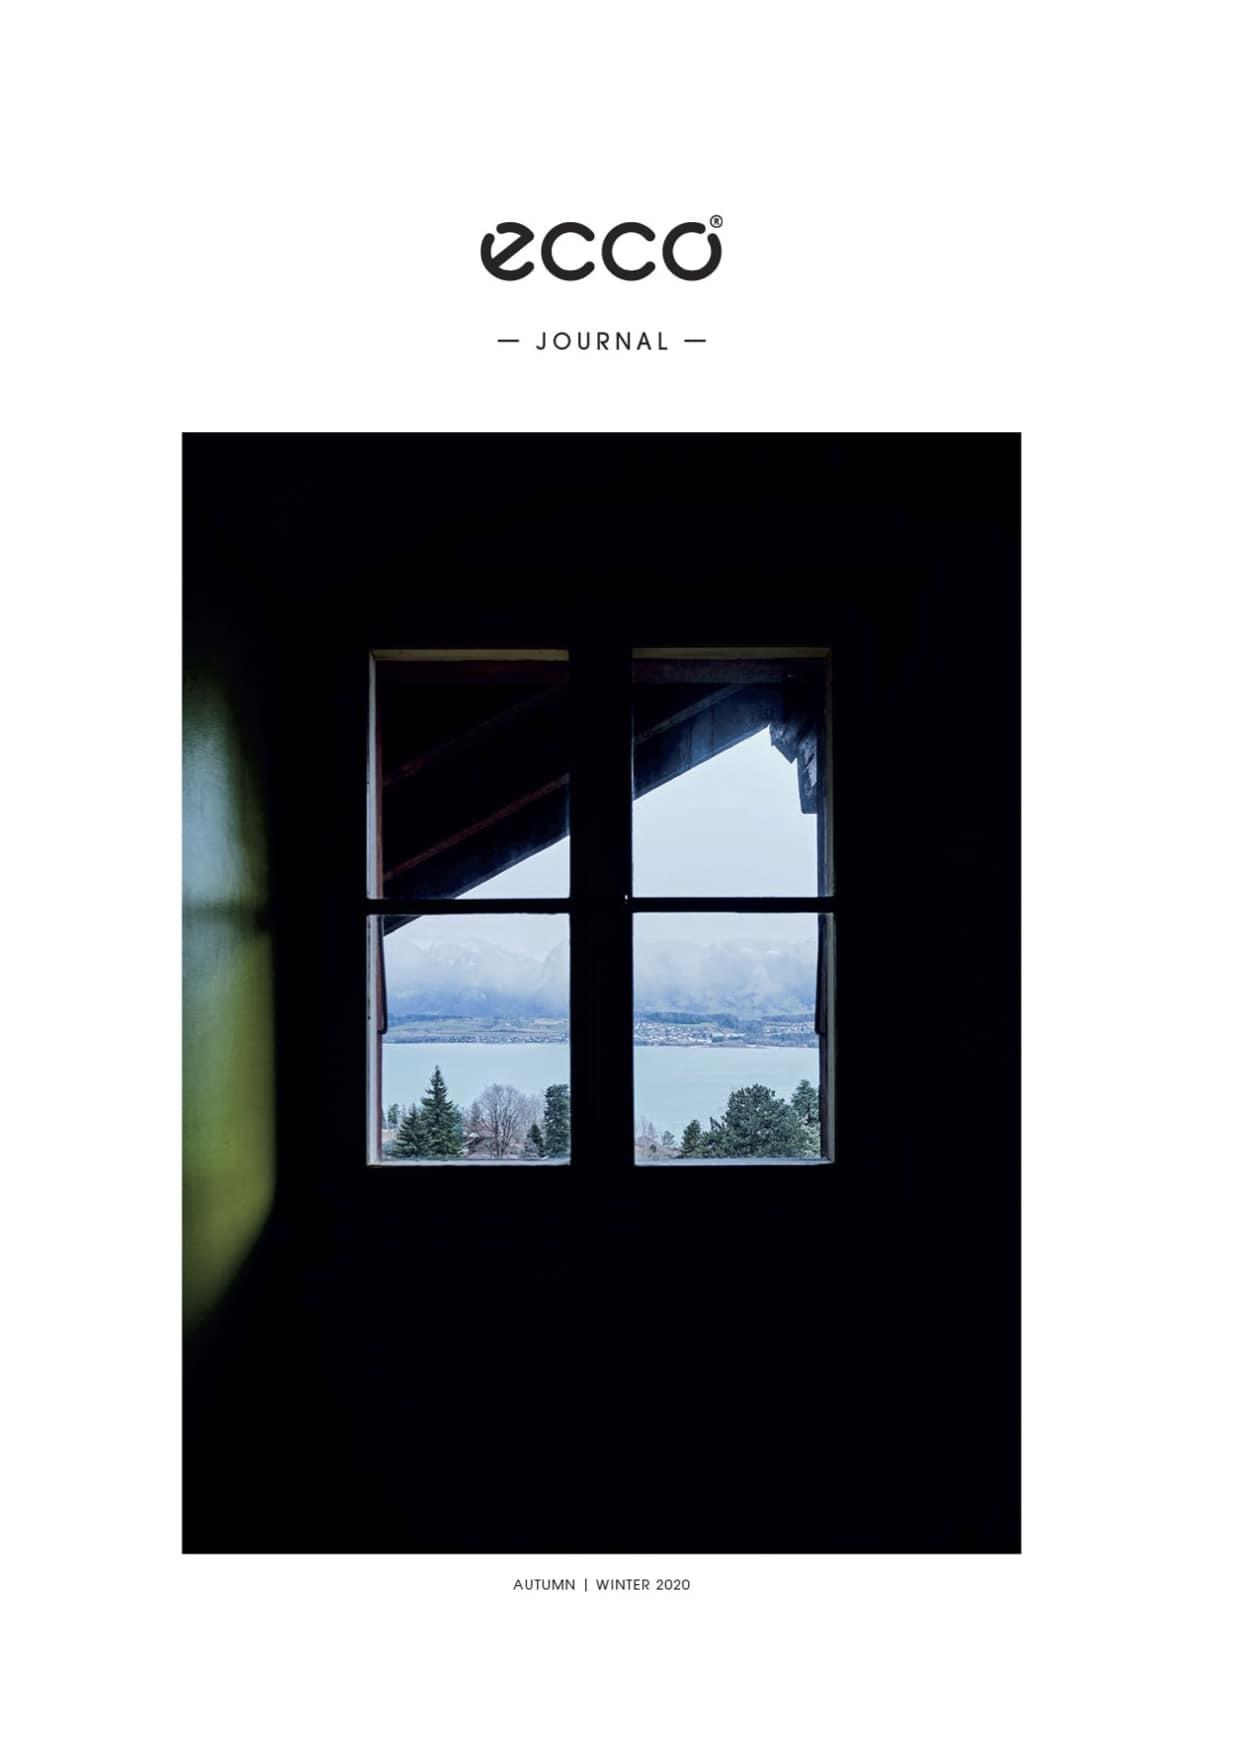 meine story im ECCO journal